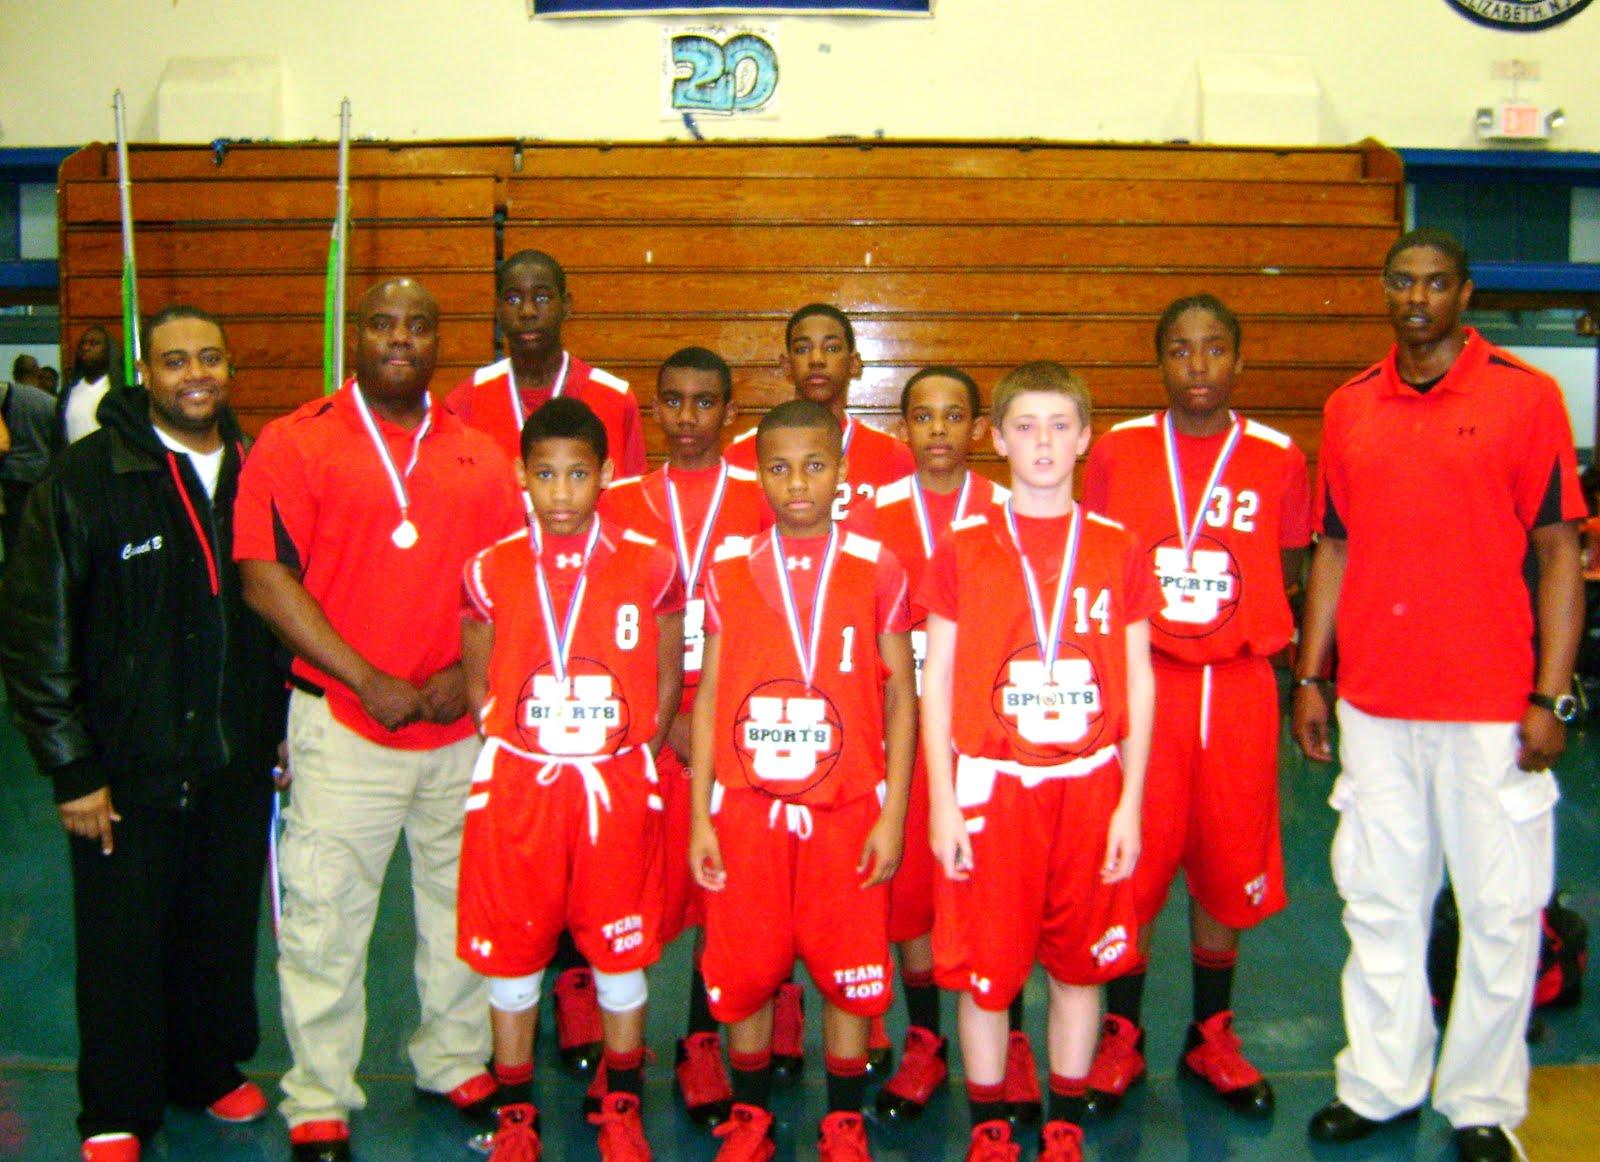 fd27e0112979 BASKETBALL SPOTLIGHT NEWS  NJ 12U AAU State Championship Recap  Team ...